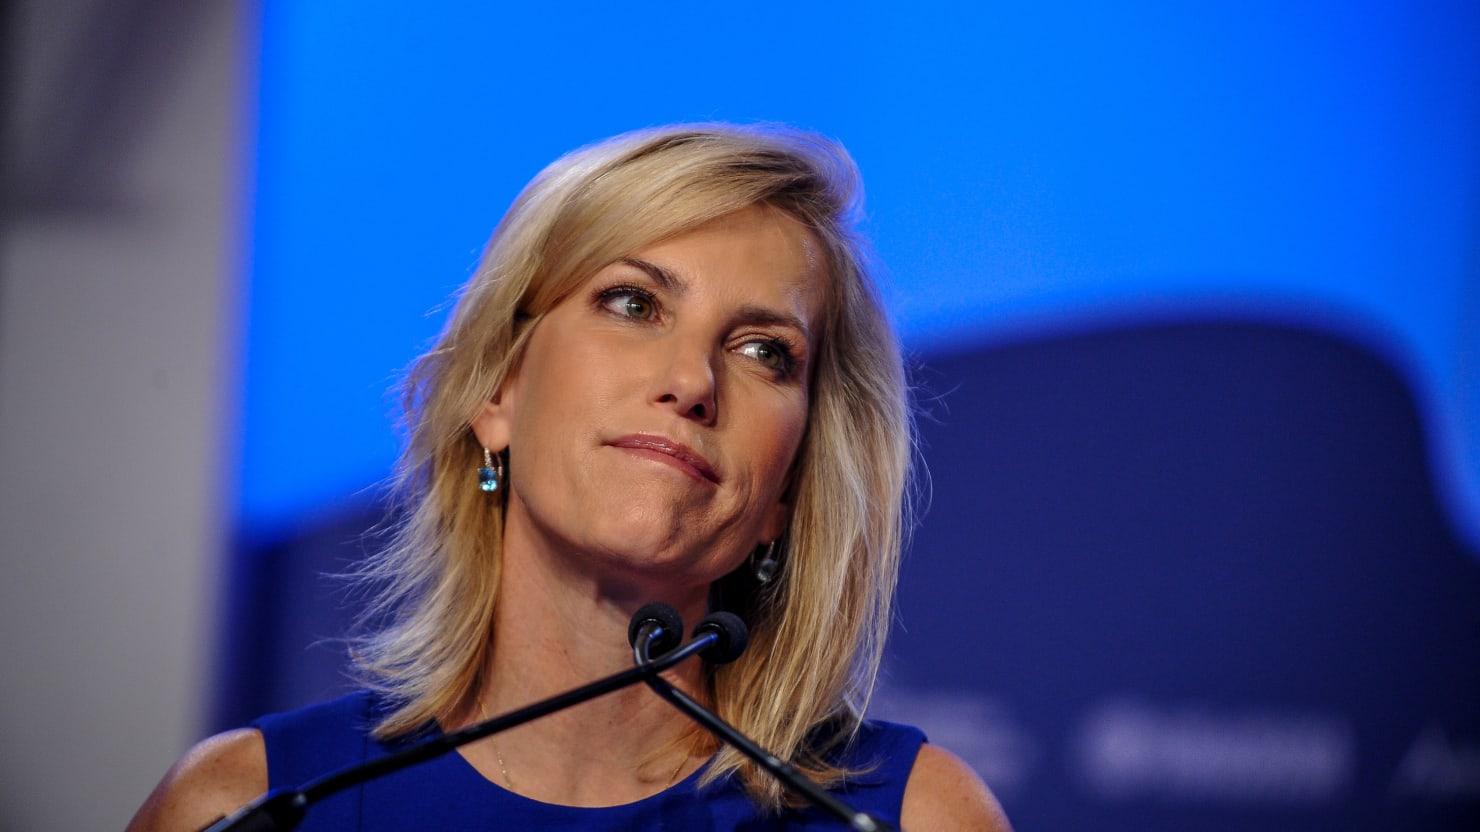 Twitter Deletes Laura Ingraham's 'Misleading' Post Touting Coronavirus Cure